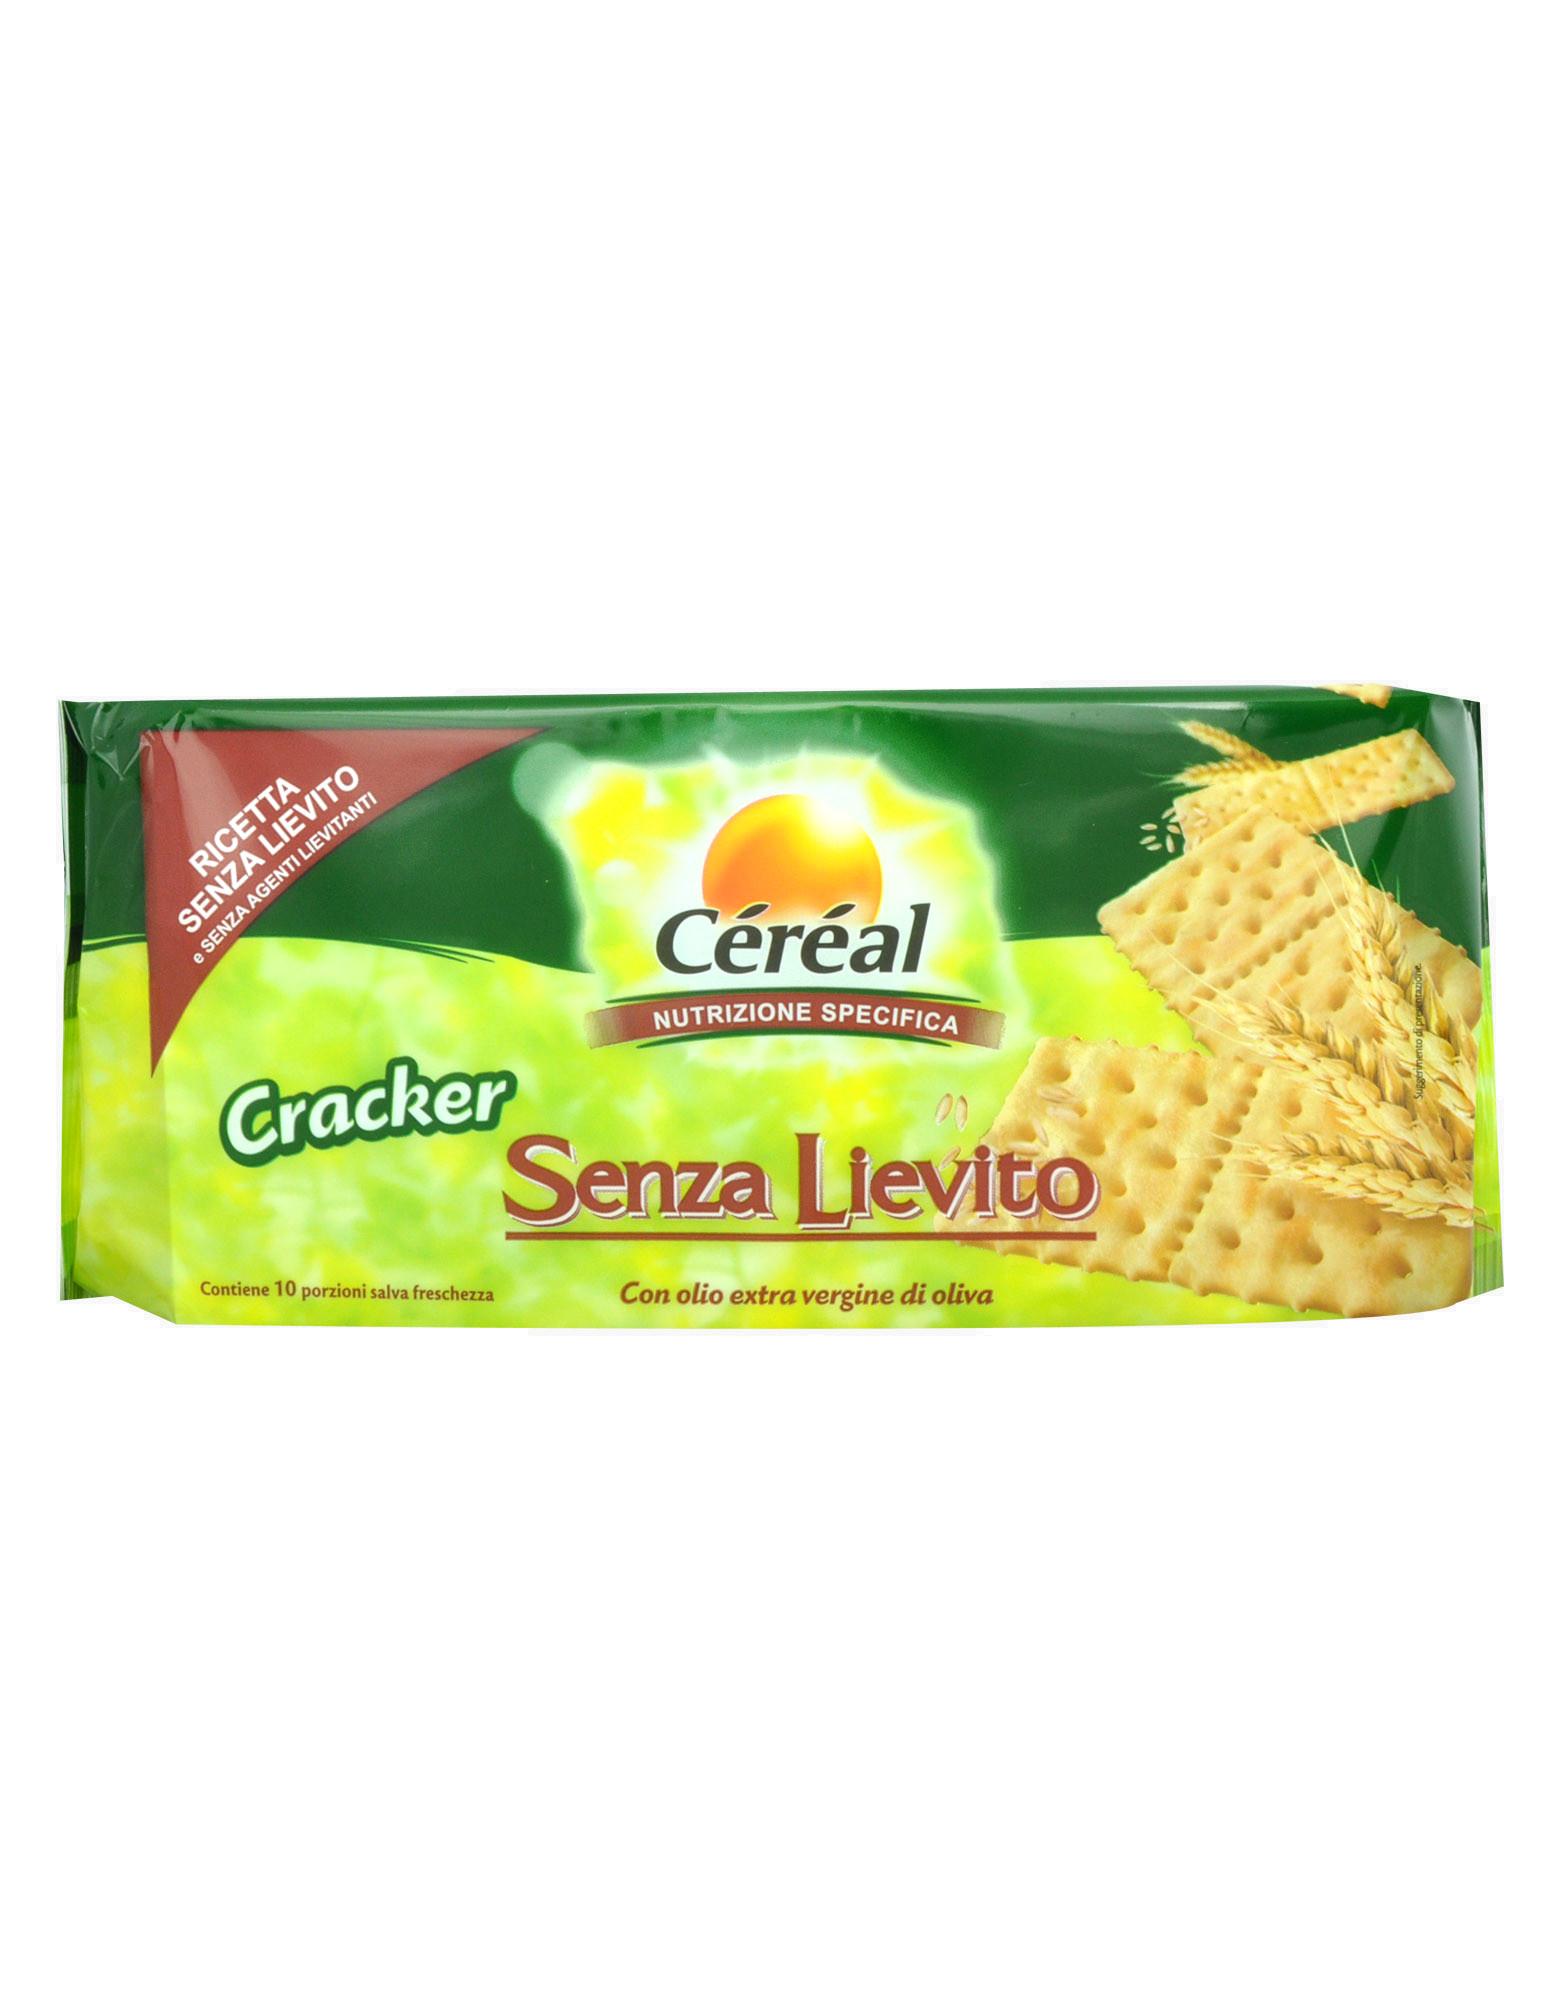 Crackers Senza Lievito Cracker Senza Lievito250